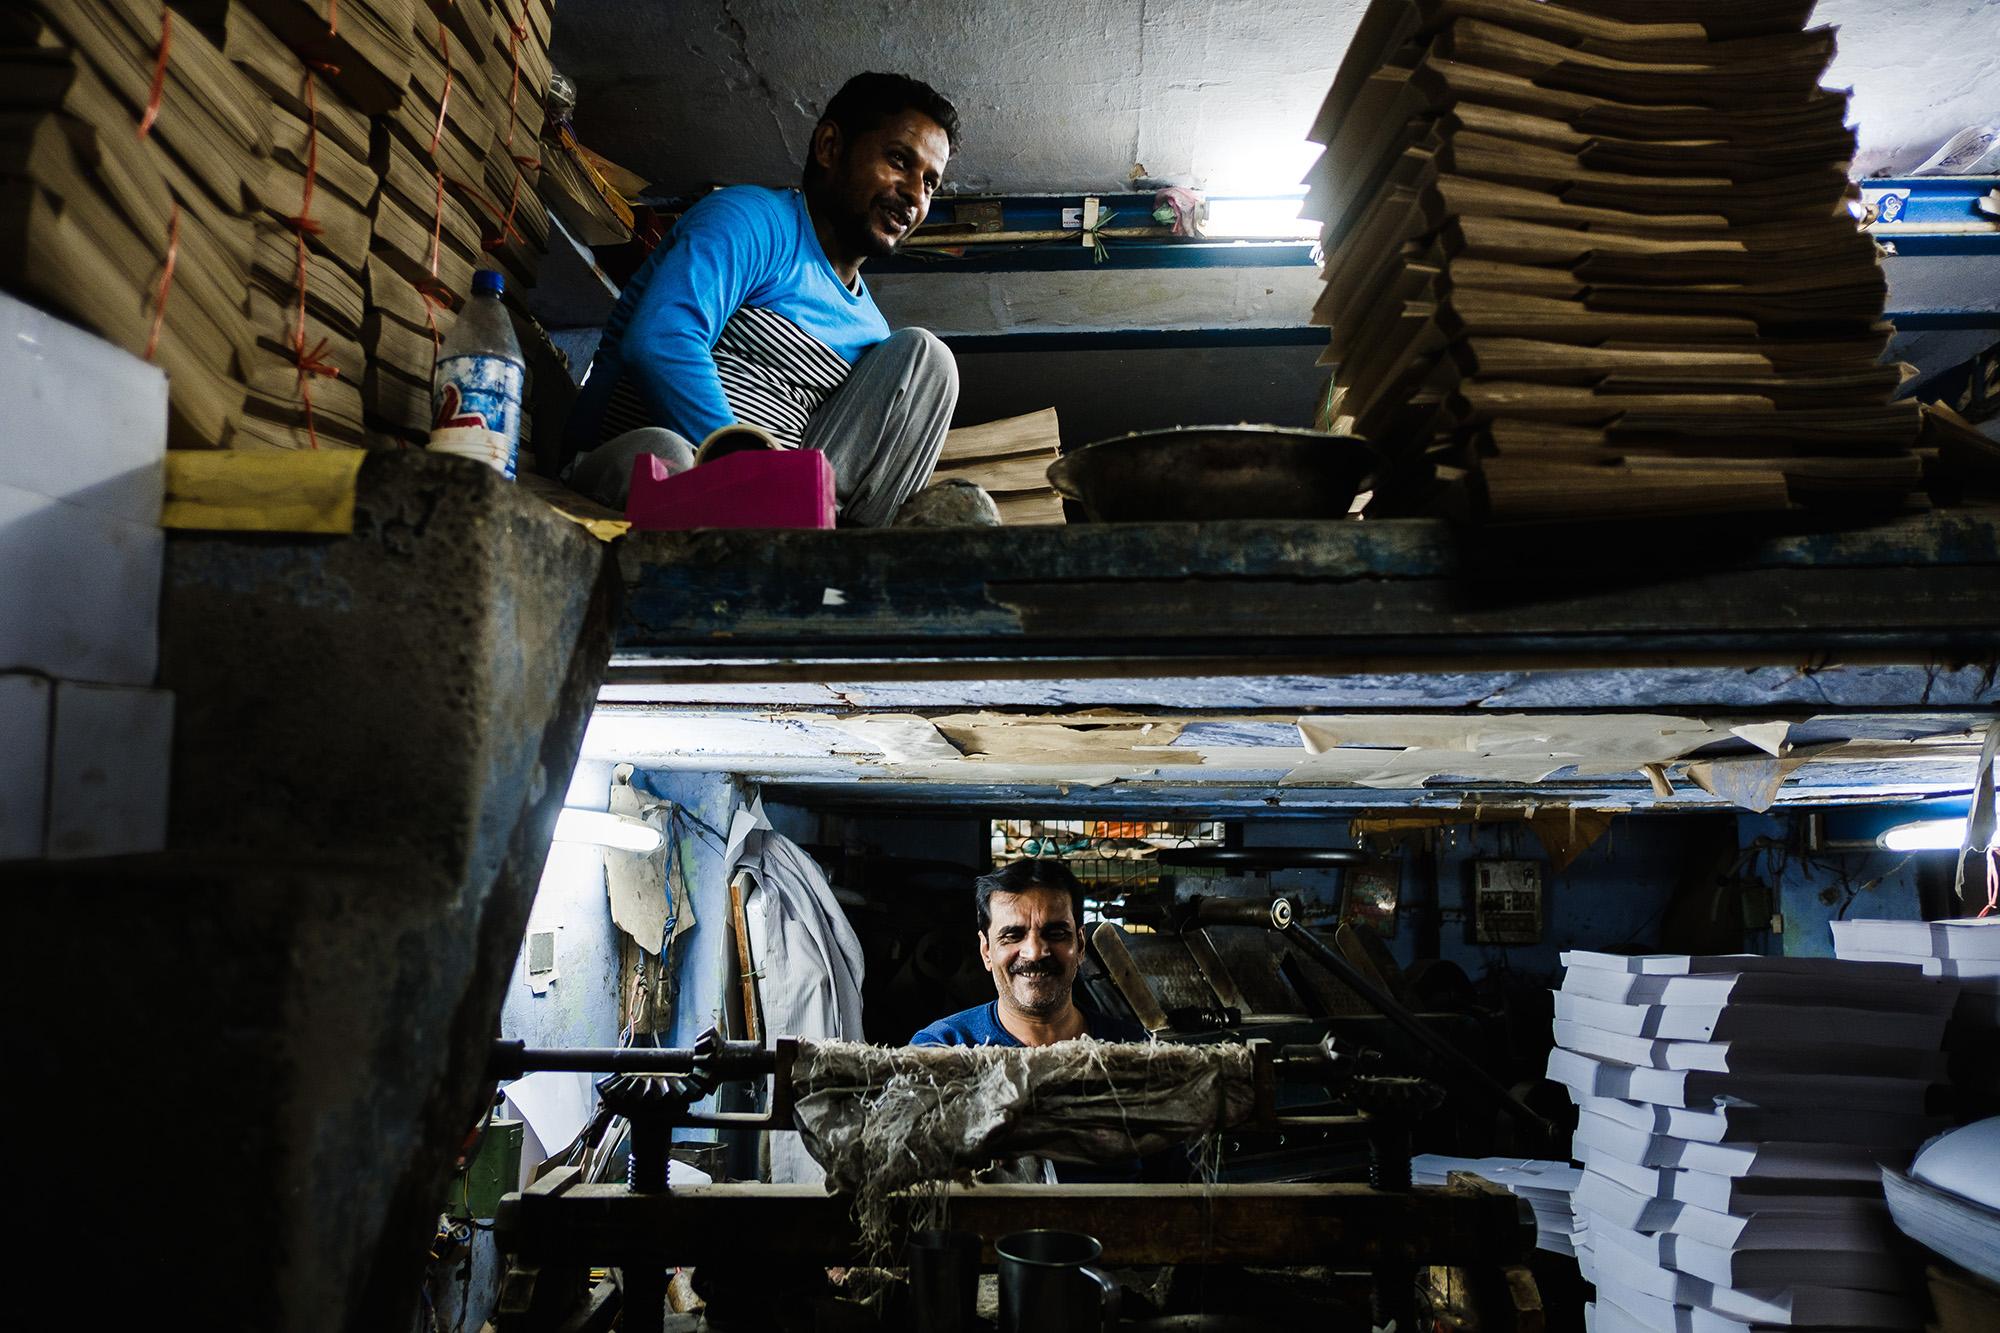 AnjaPoehlmann_India-Delhi_019.jpg